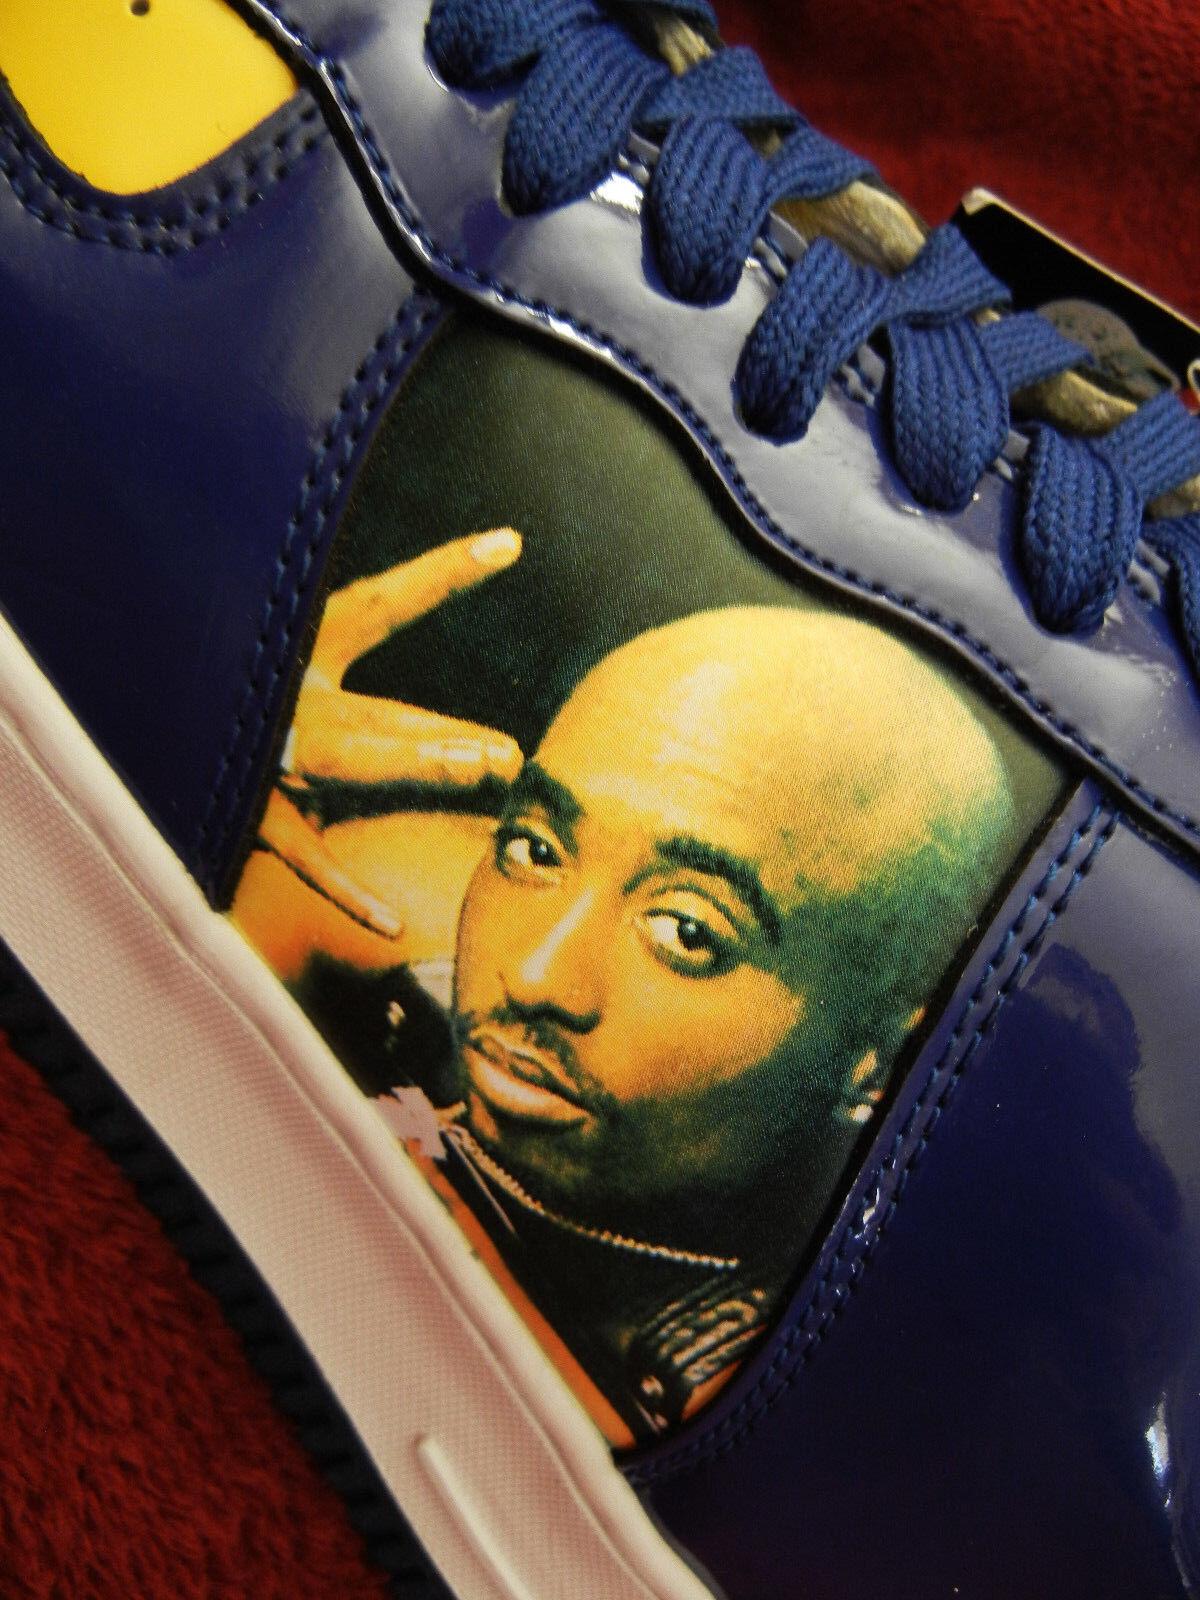 2PAC Makaveli #GOLDEN STATE WARRIORS size 12 scarpe da ginnastica Tupac DEMETRI  SHIPP JR.